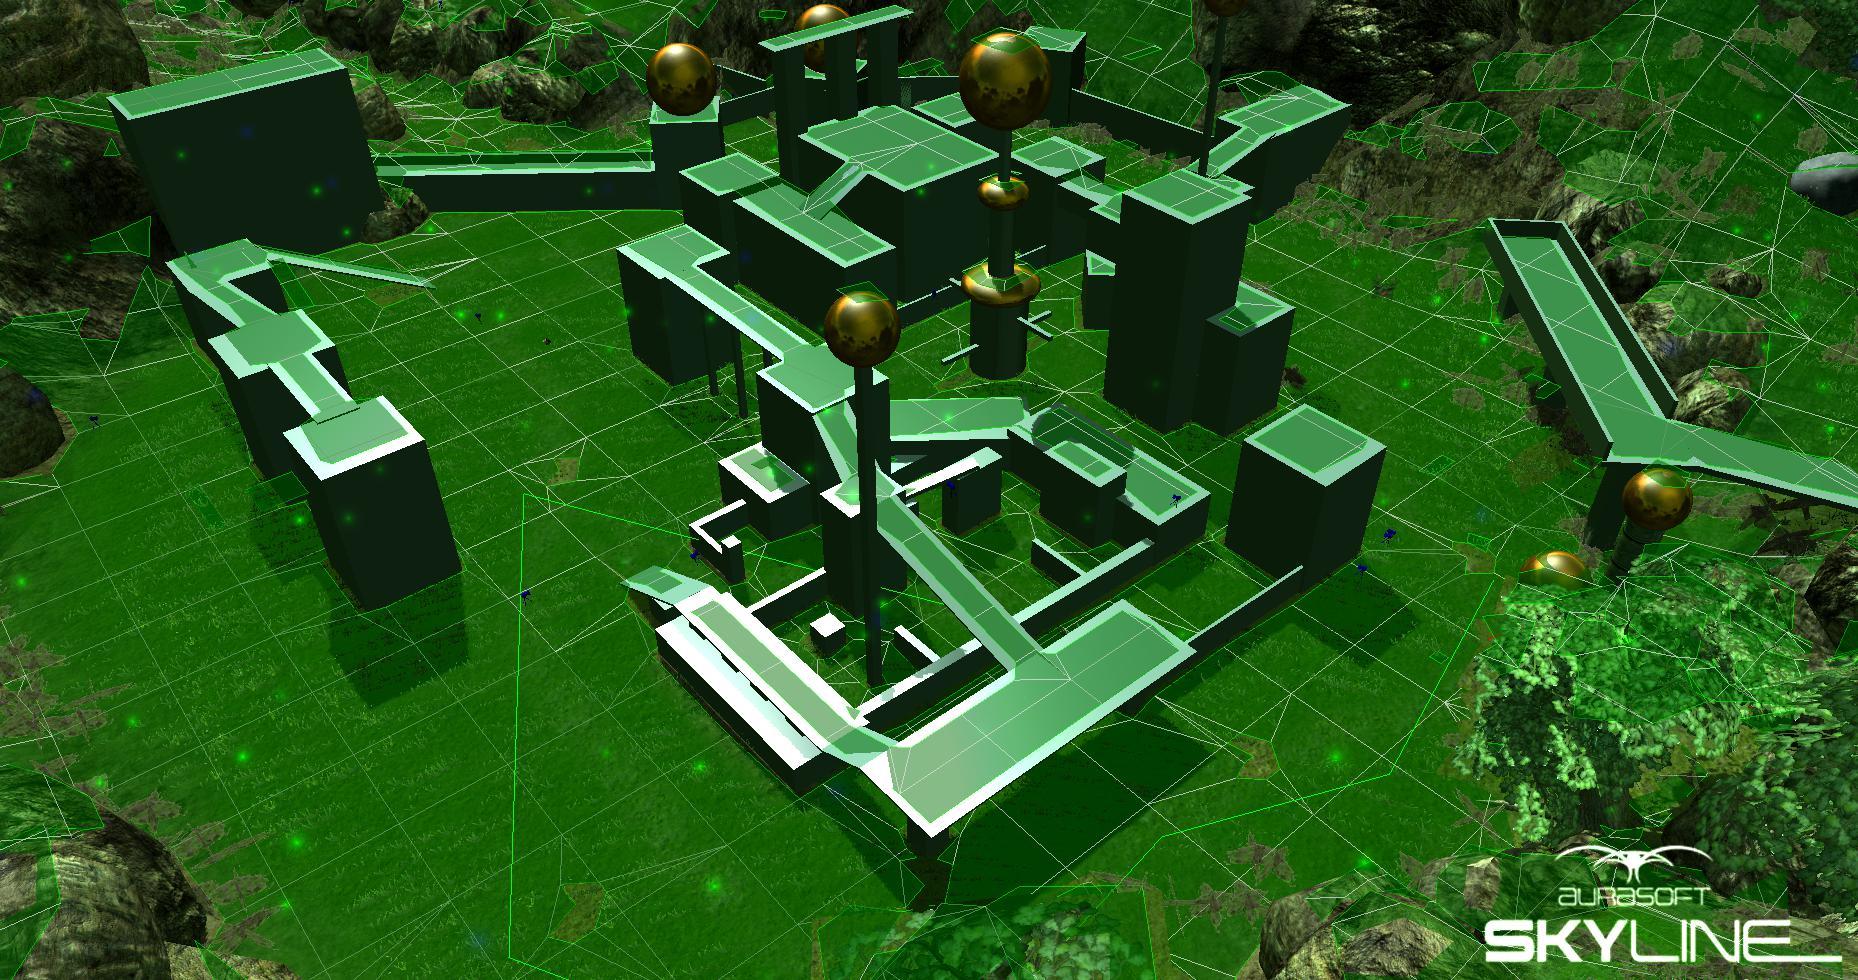 game engine | OGRE - Open Source 3D Graphics Engine